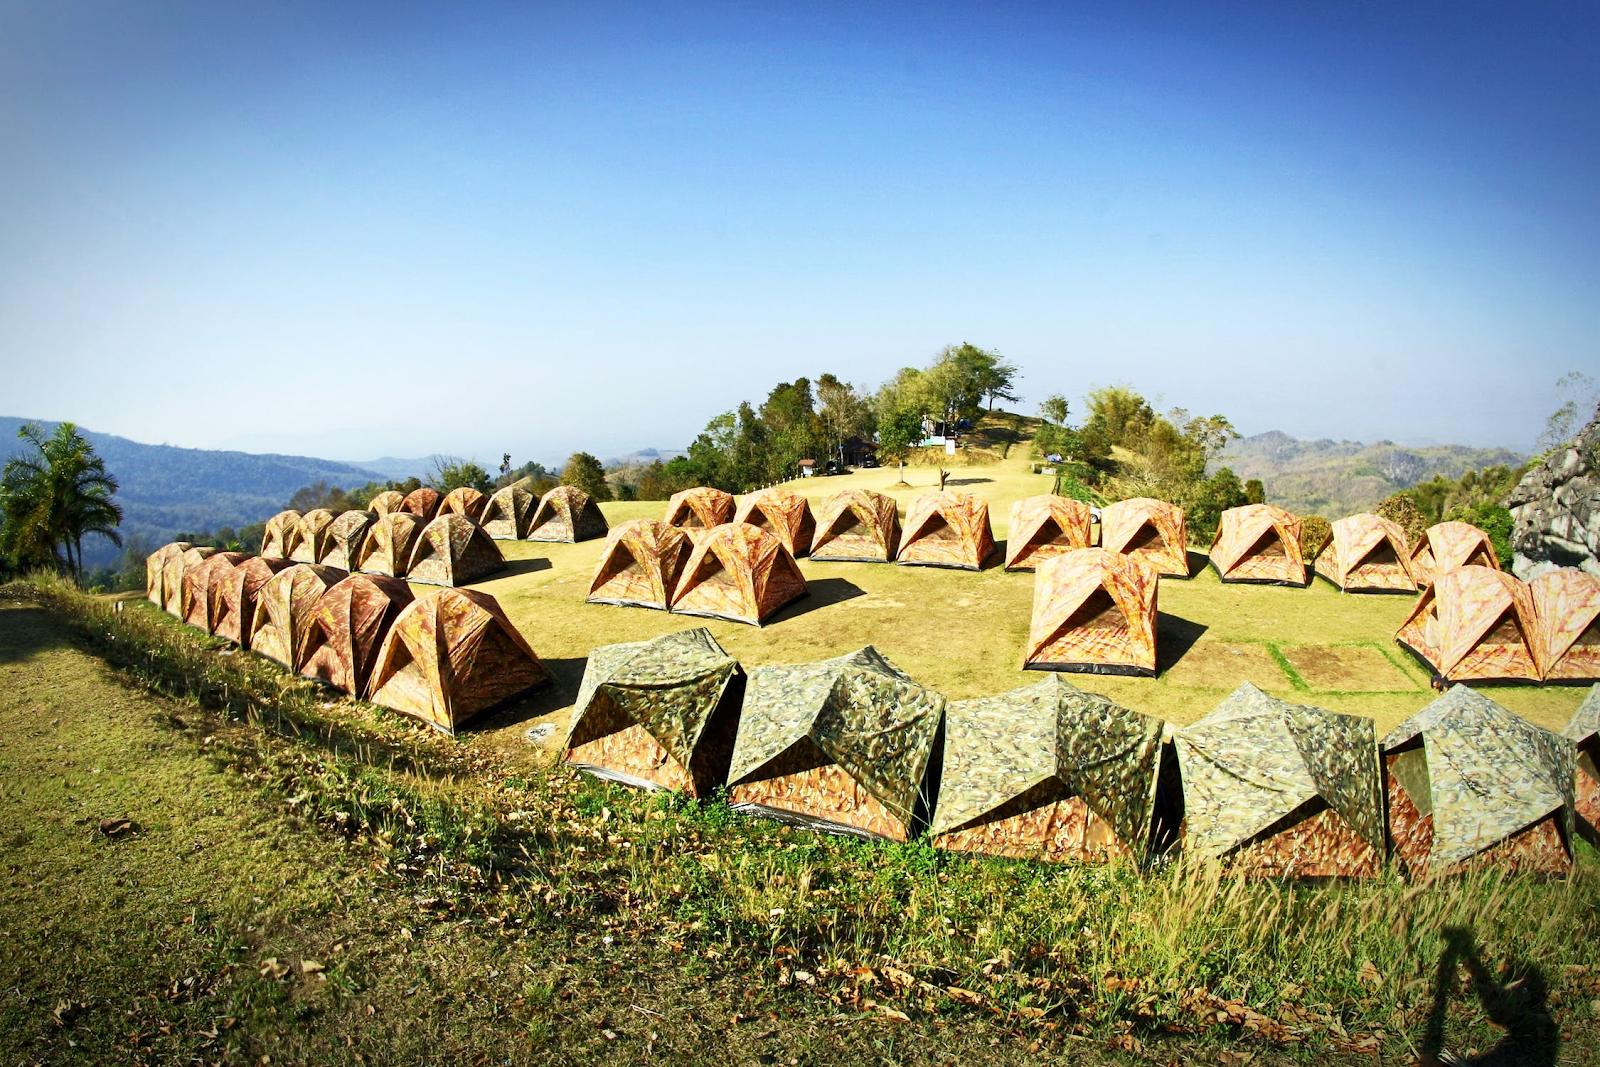 camping tips 2018 festivals